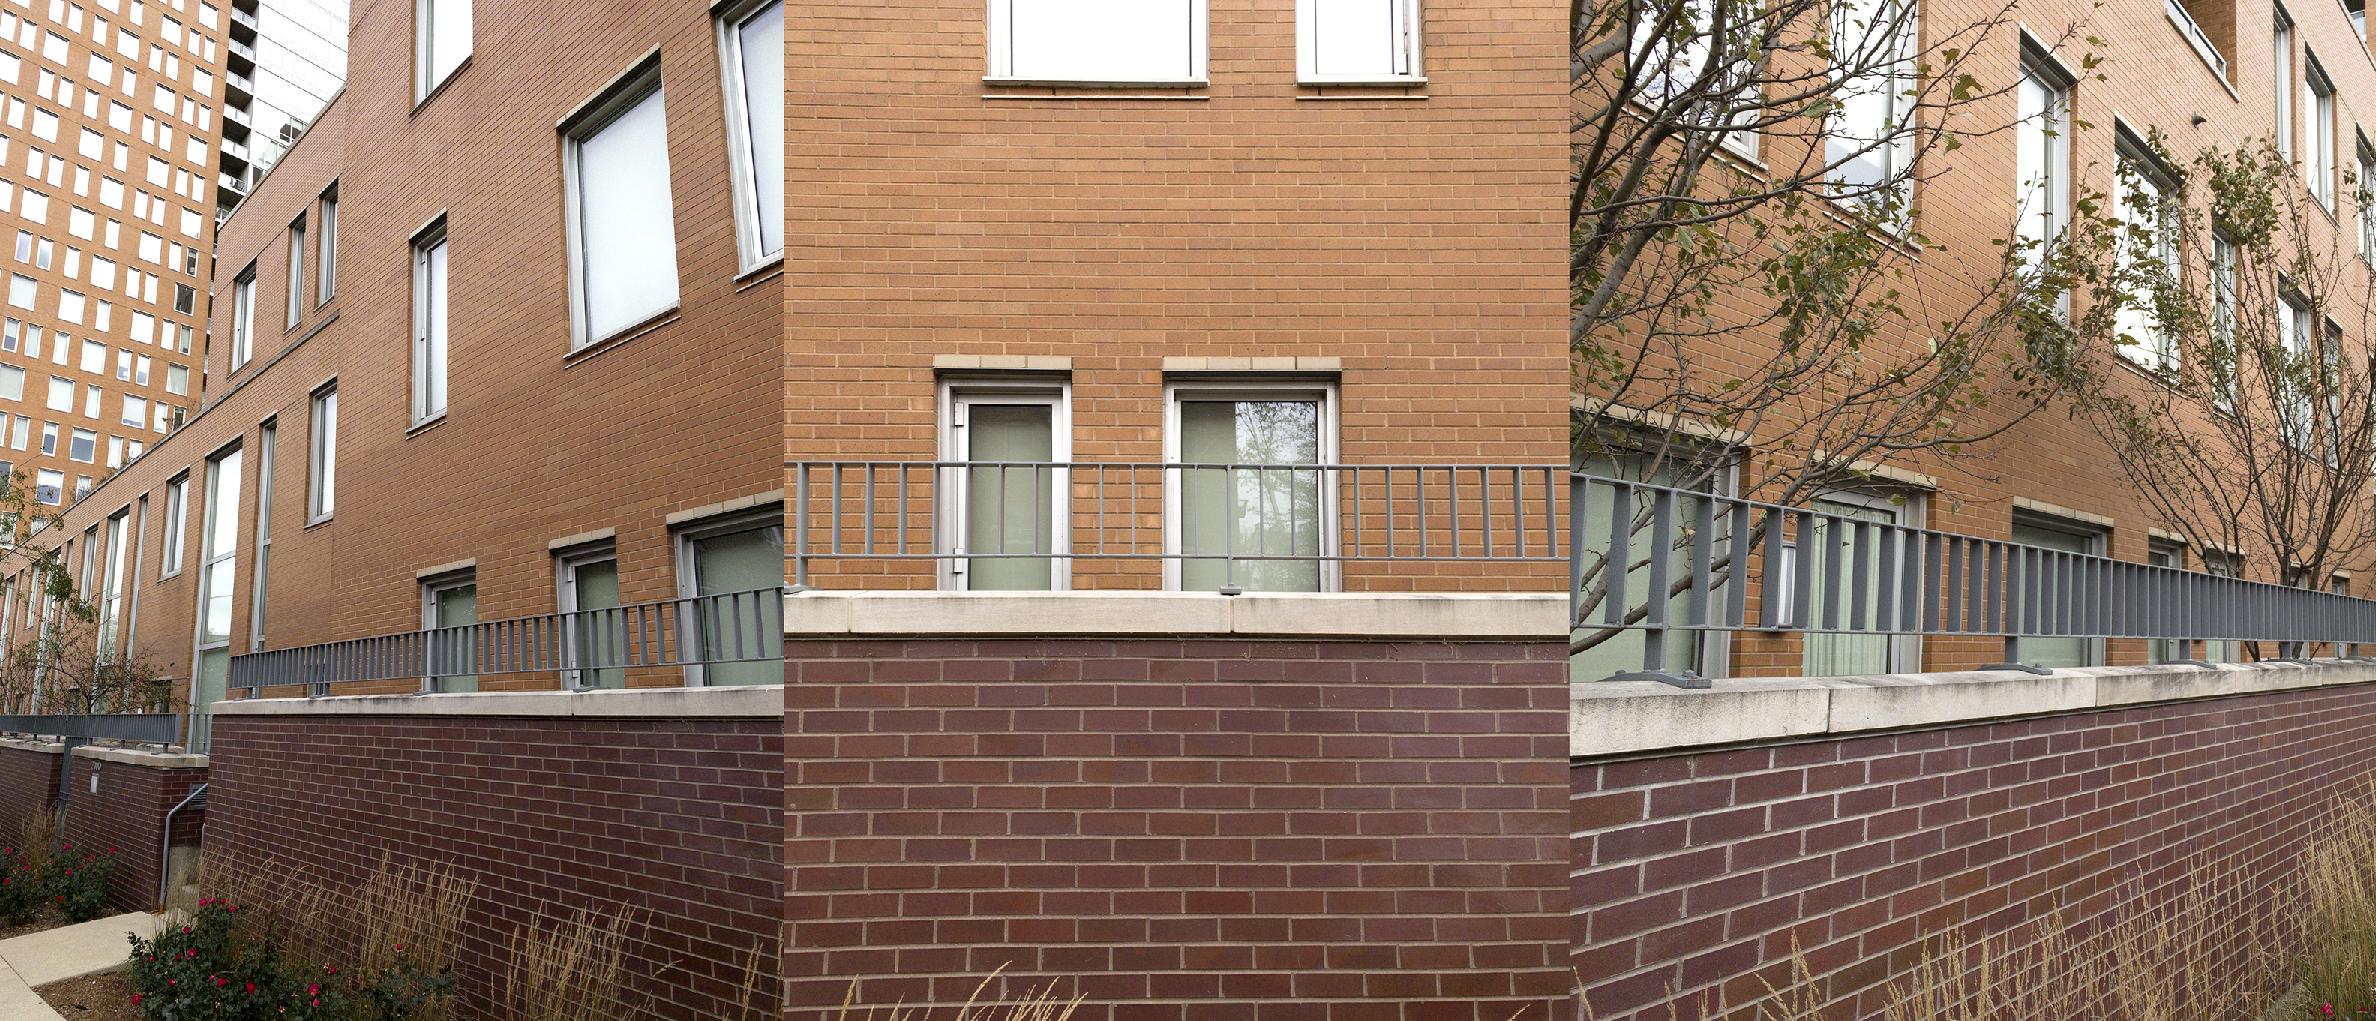 Bricks A IMG_0081